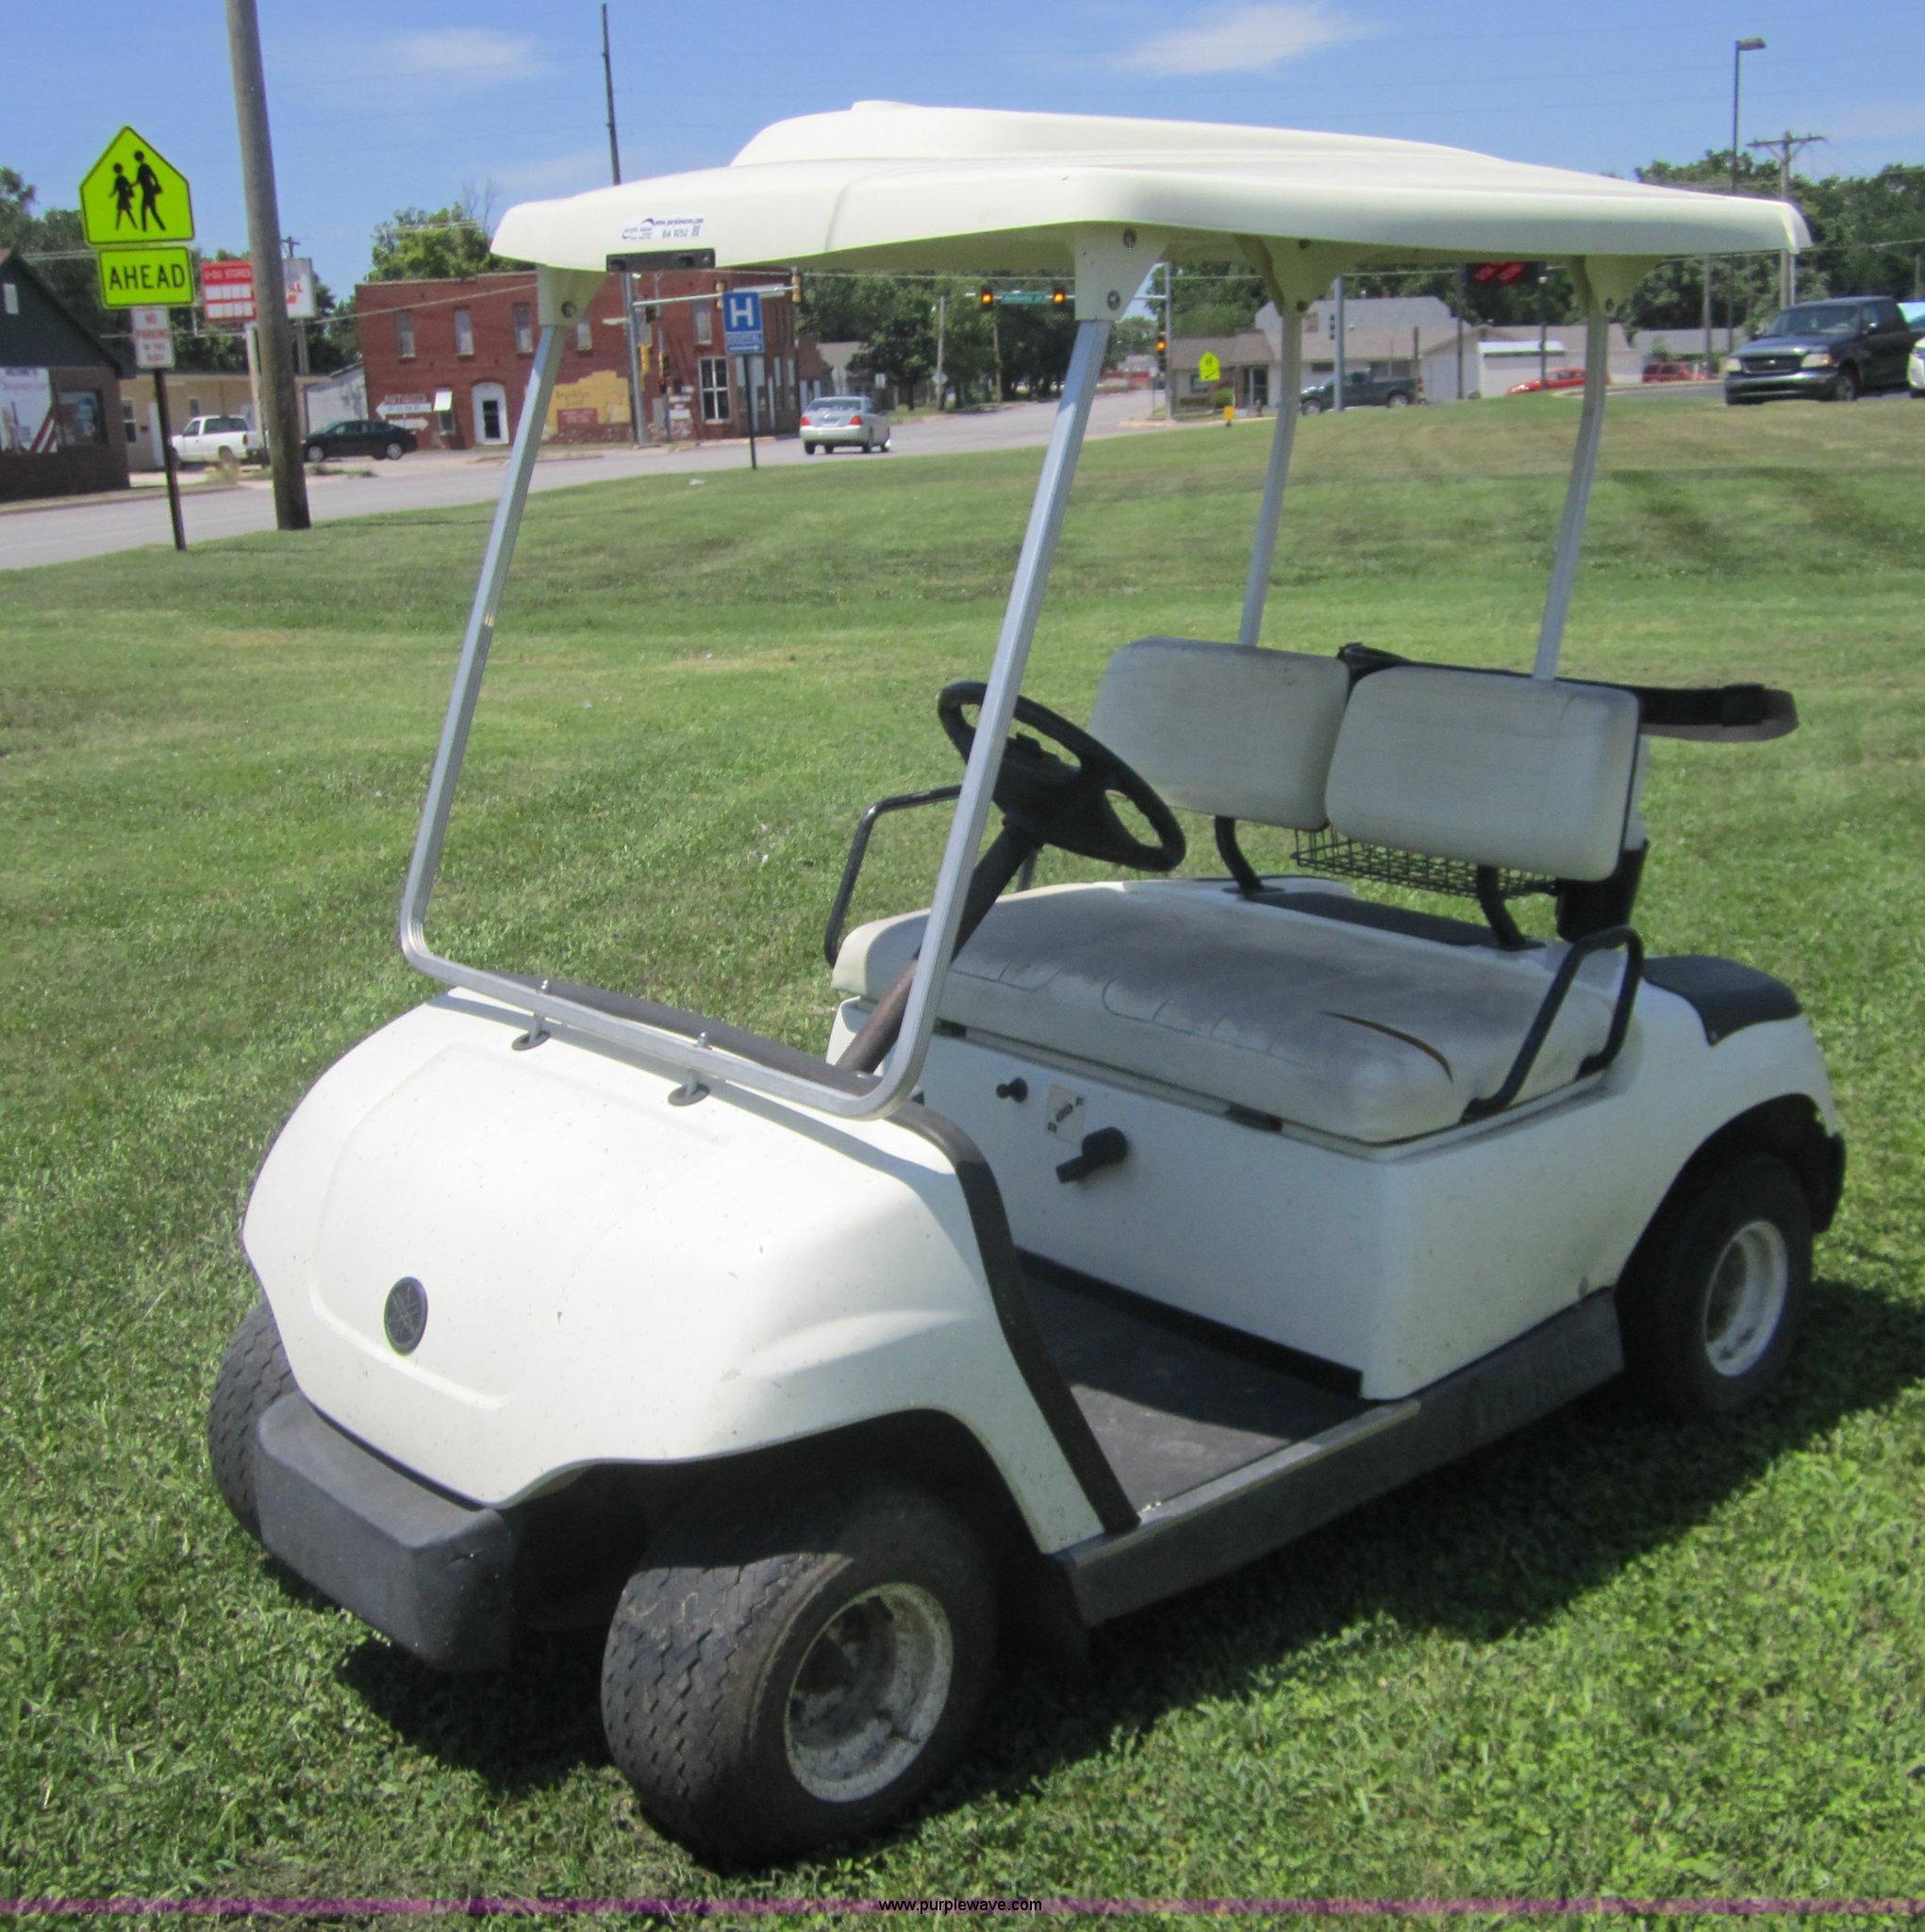 2003 Yamaha G22 Golf Cart G22a Wiring Diagram Item Ba9252 Sold July 29 Veh Rh Purplewave Com Specs Parts